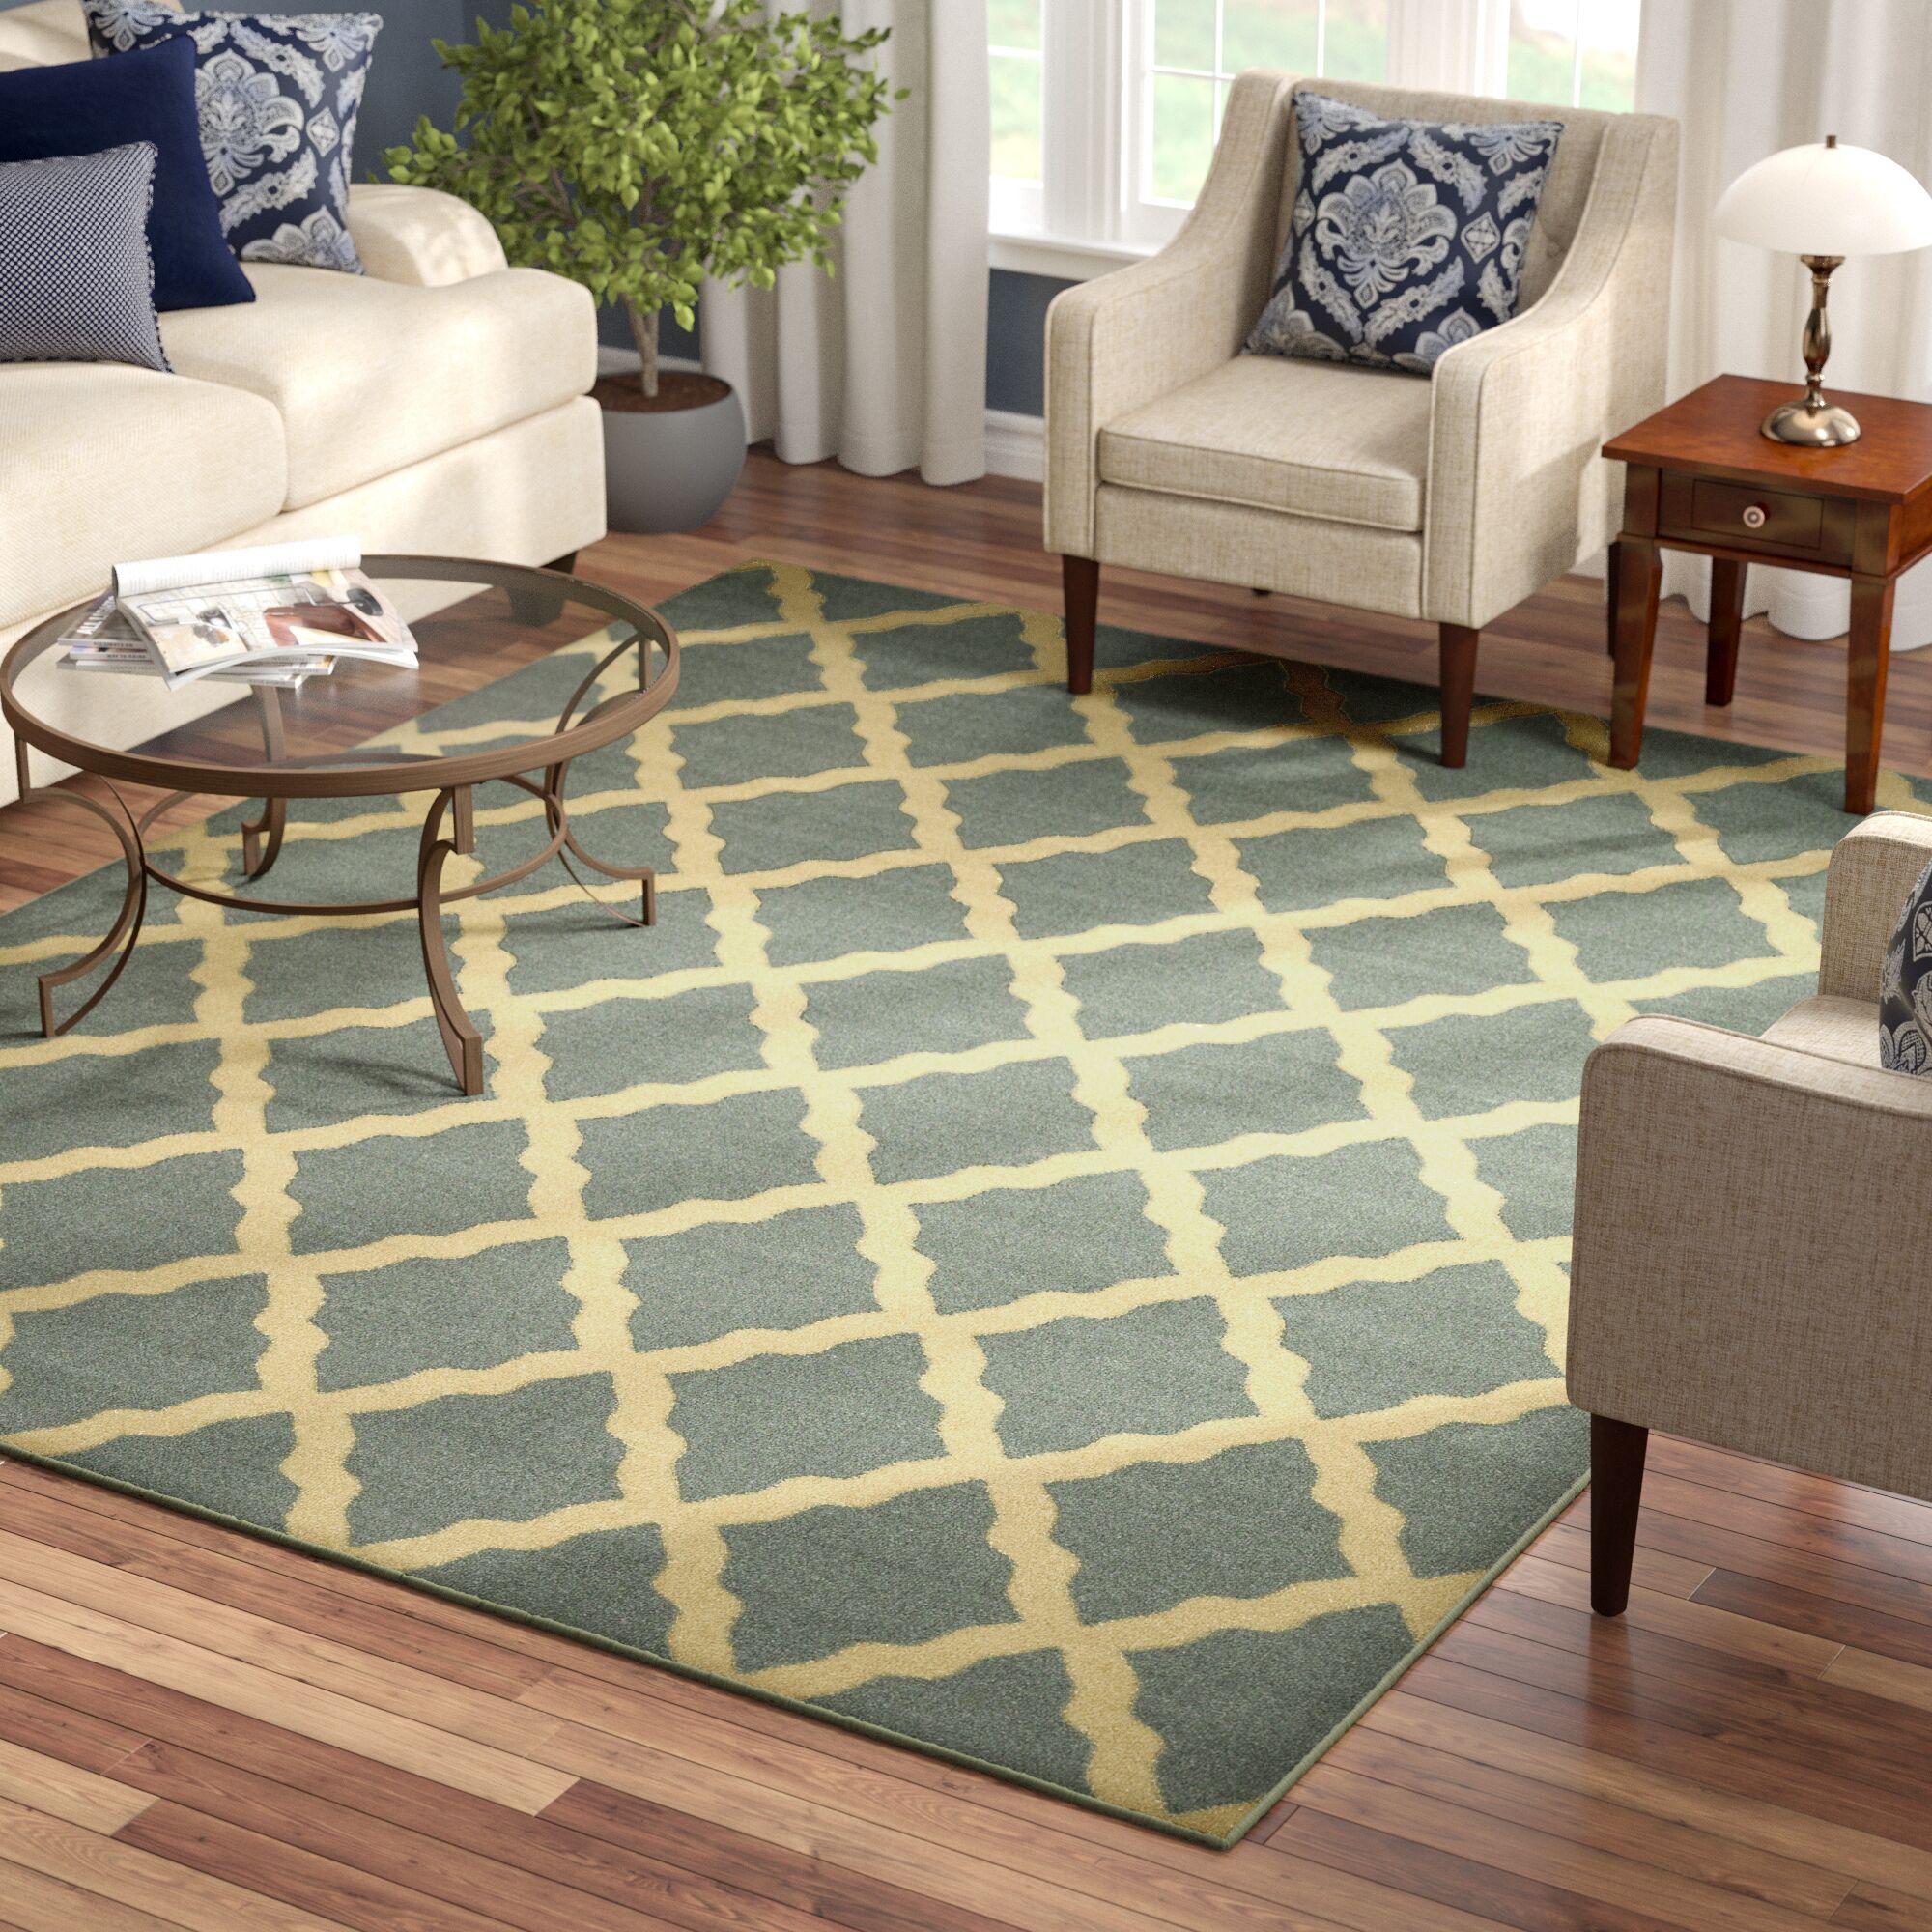 Bunyard Moroccan Trellis Design Sage Green Area Rug Rug Size: Rectangle 8'2